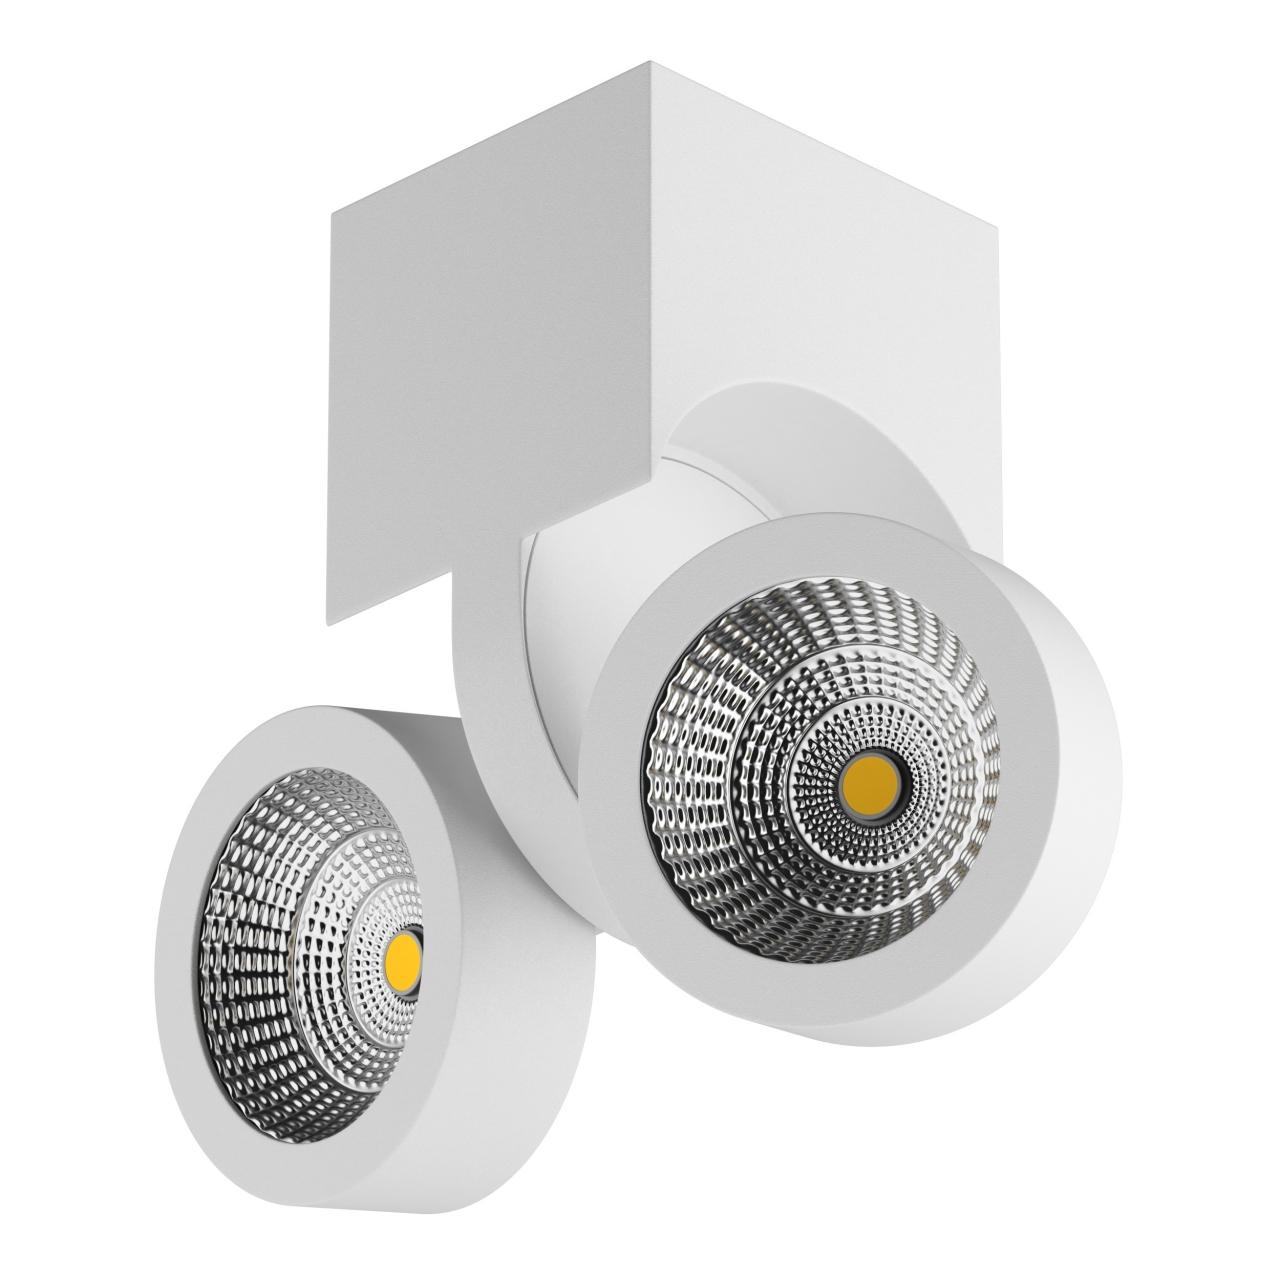 Светильник Snodo LED 2*10W 1960LM 23G белый 4000K IP20 Lightstar 055364